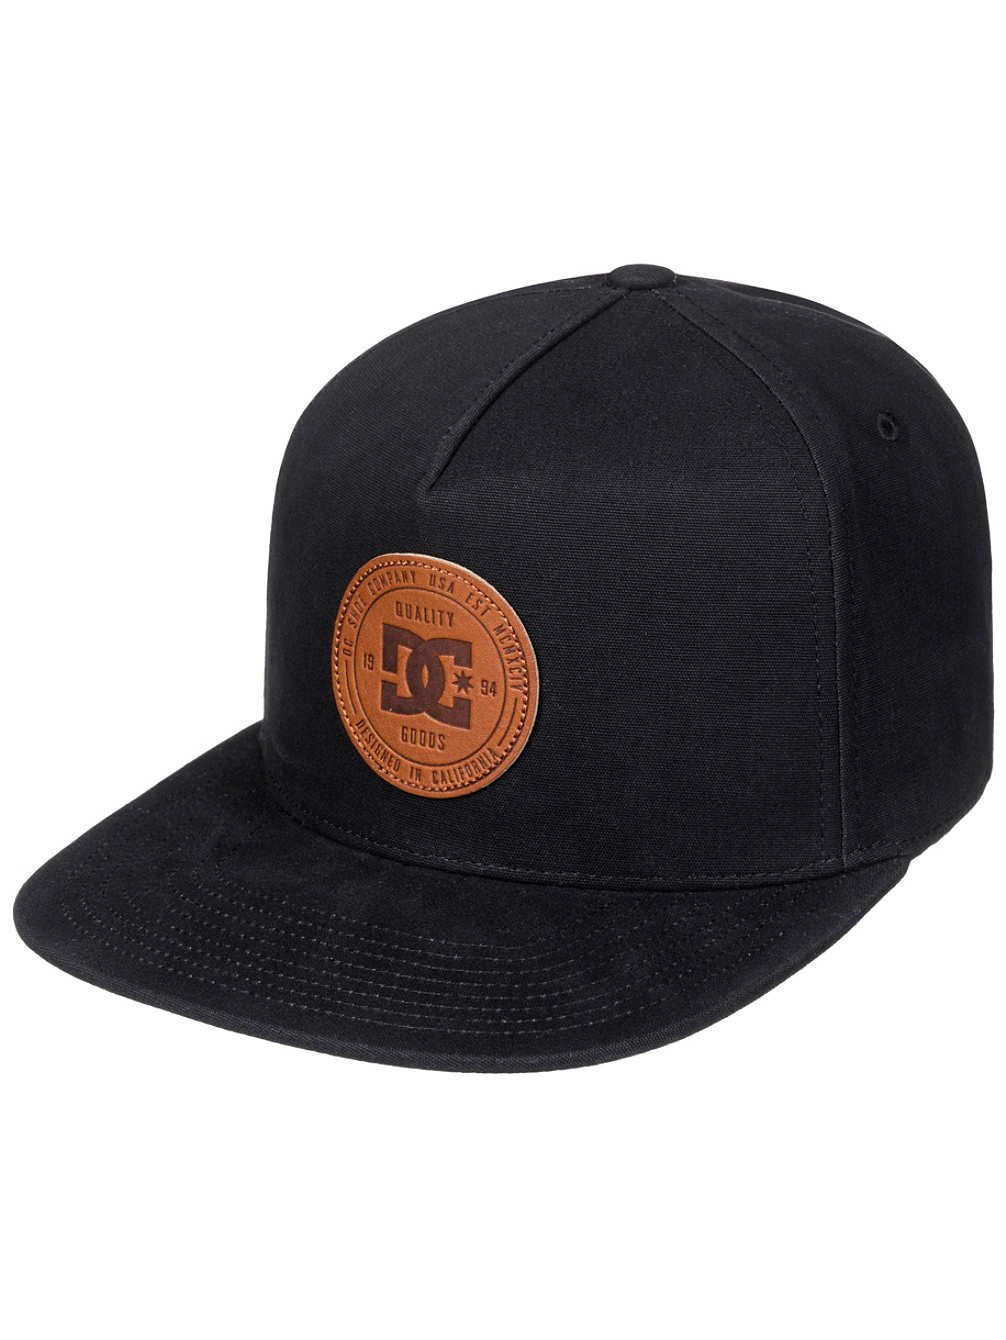 Cappellino Snapback Proceeder DC Shoes Co cappellino baseball cap Taglia unica - blu Dcshoes ADYHA03543-BMK0